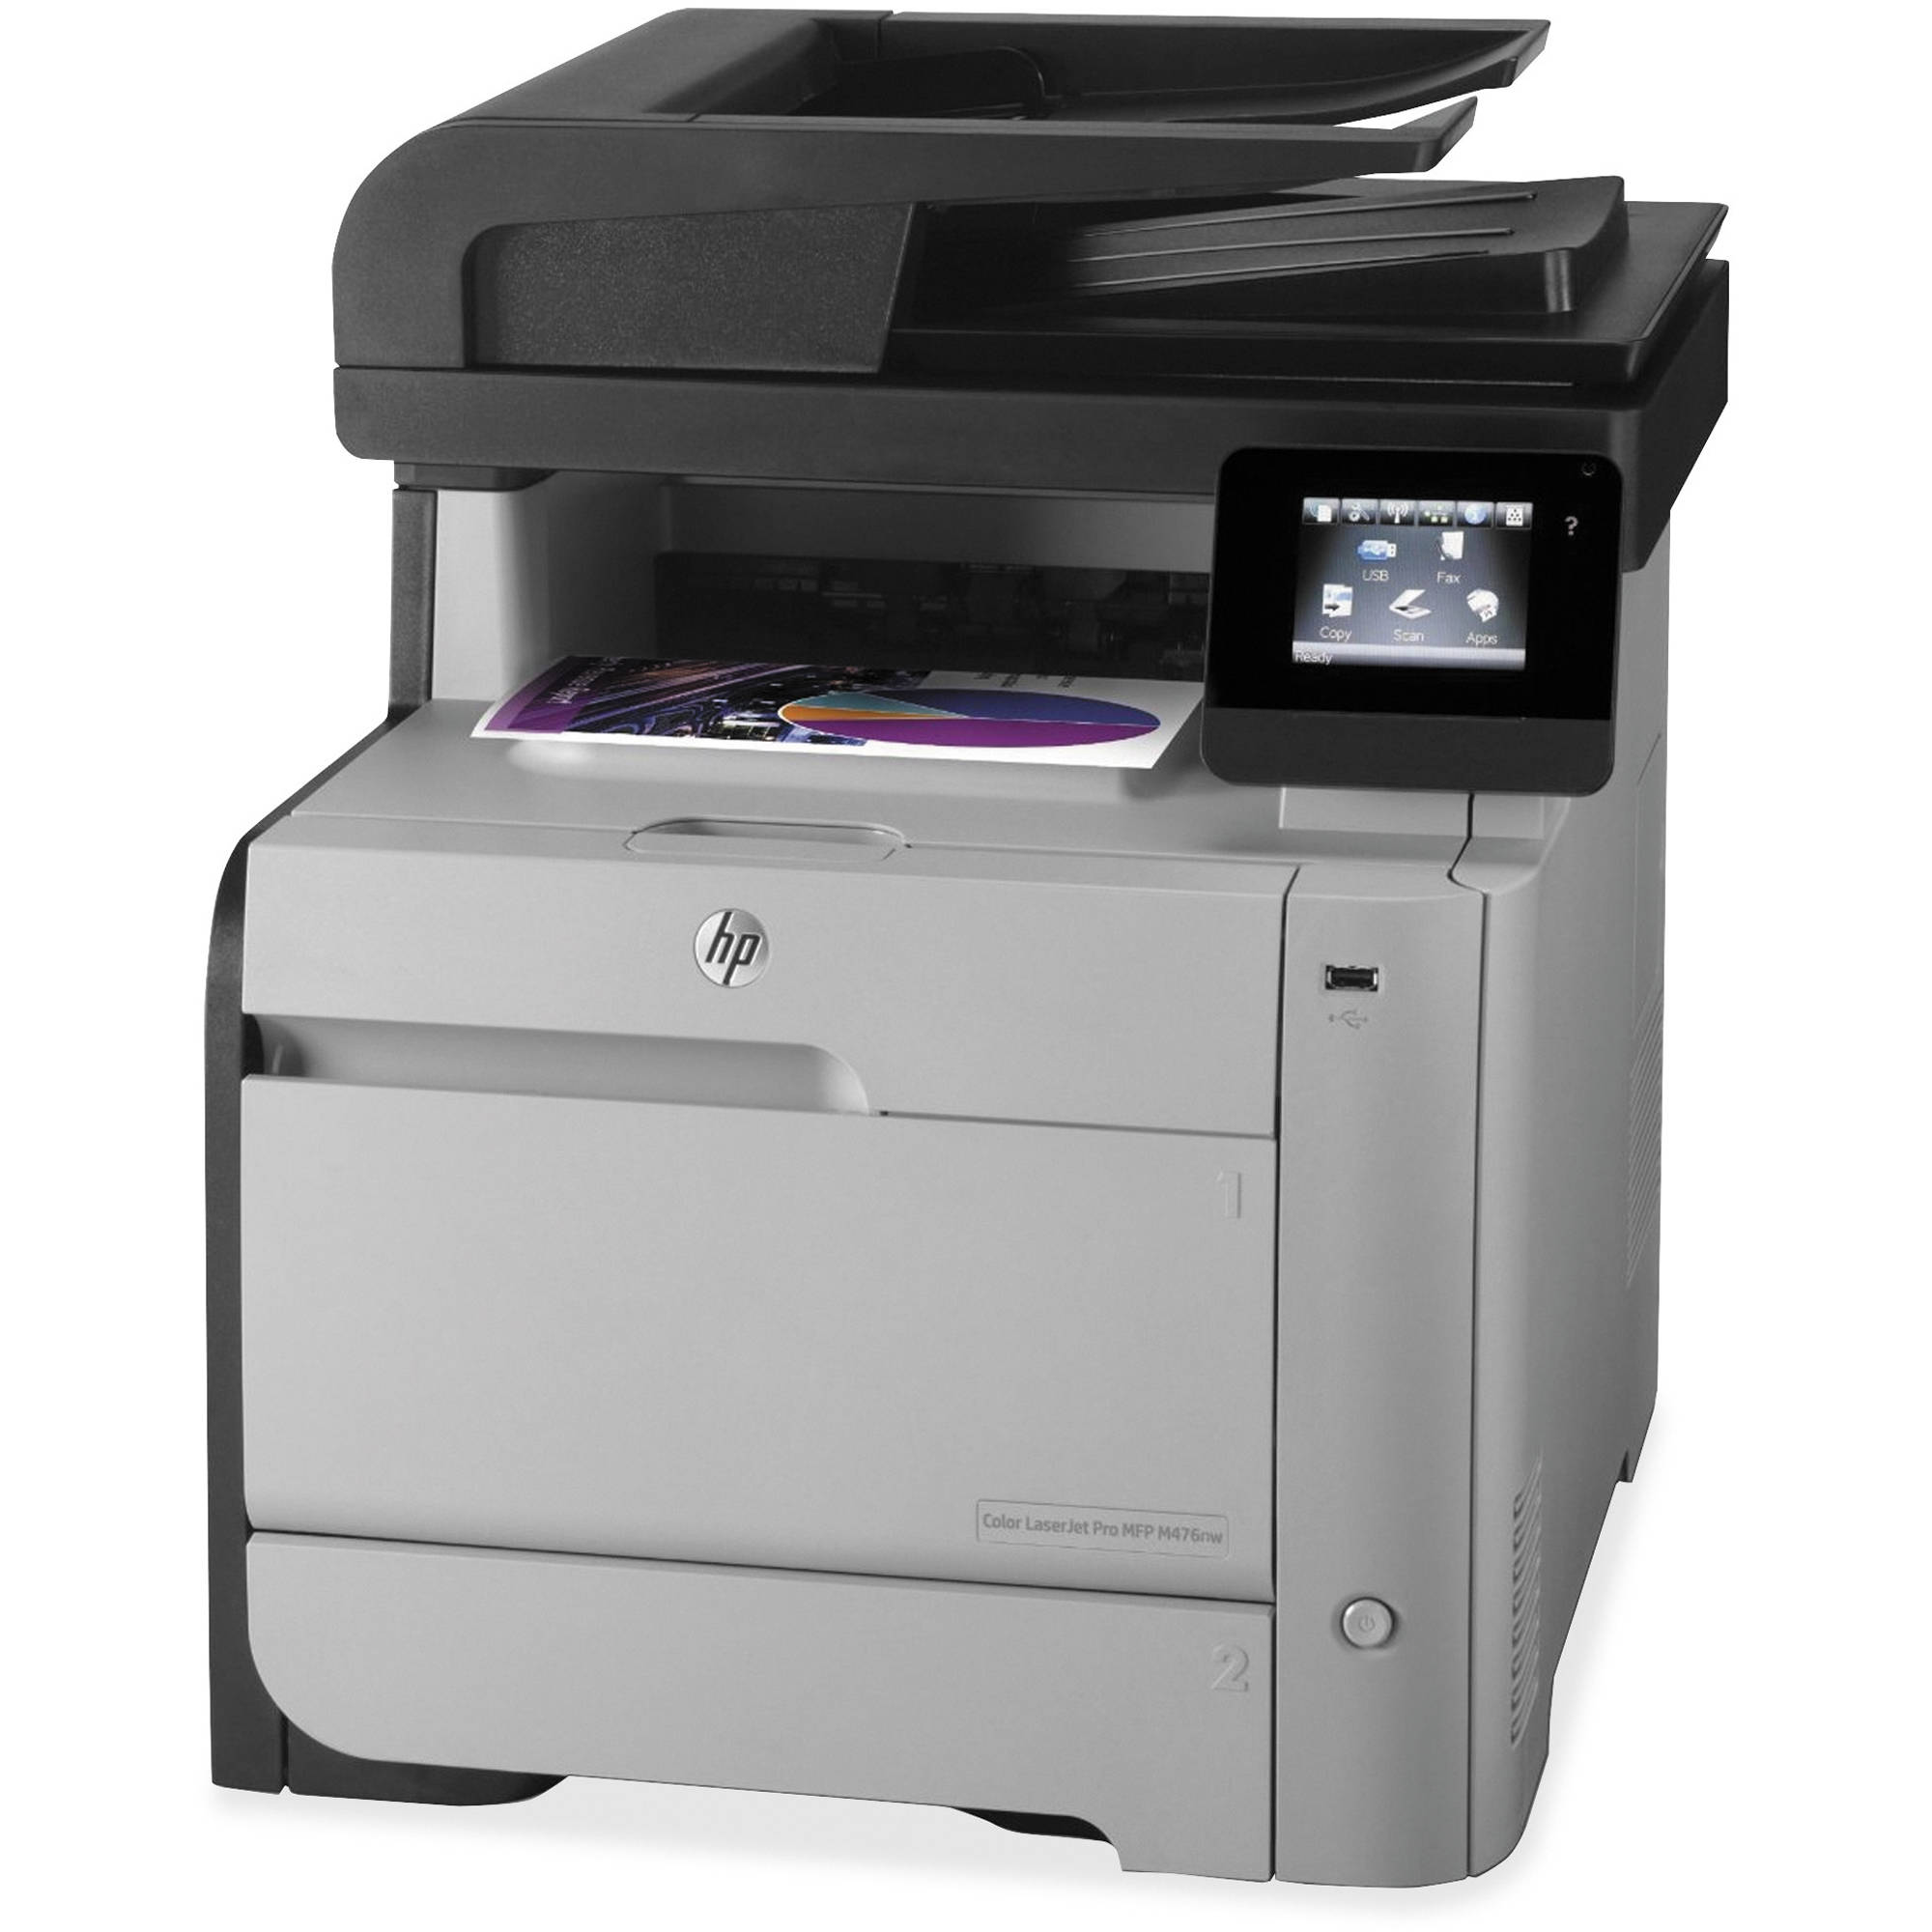 HP M476nw LaserJet Pro All In One Color Laser Printer